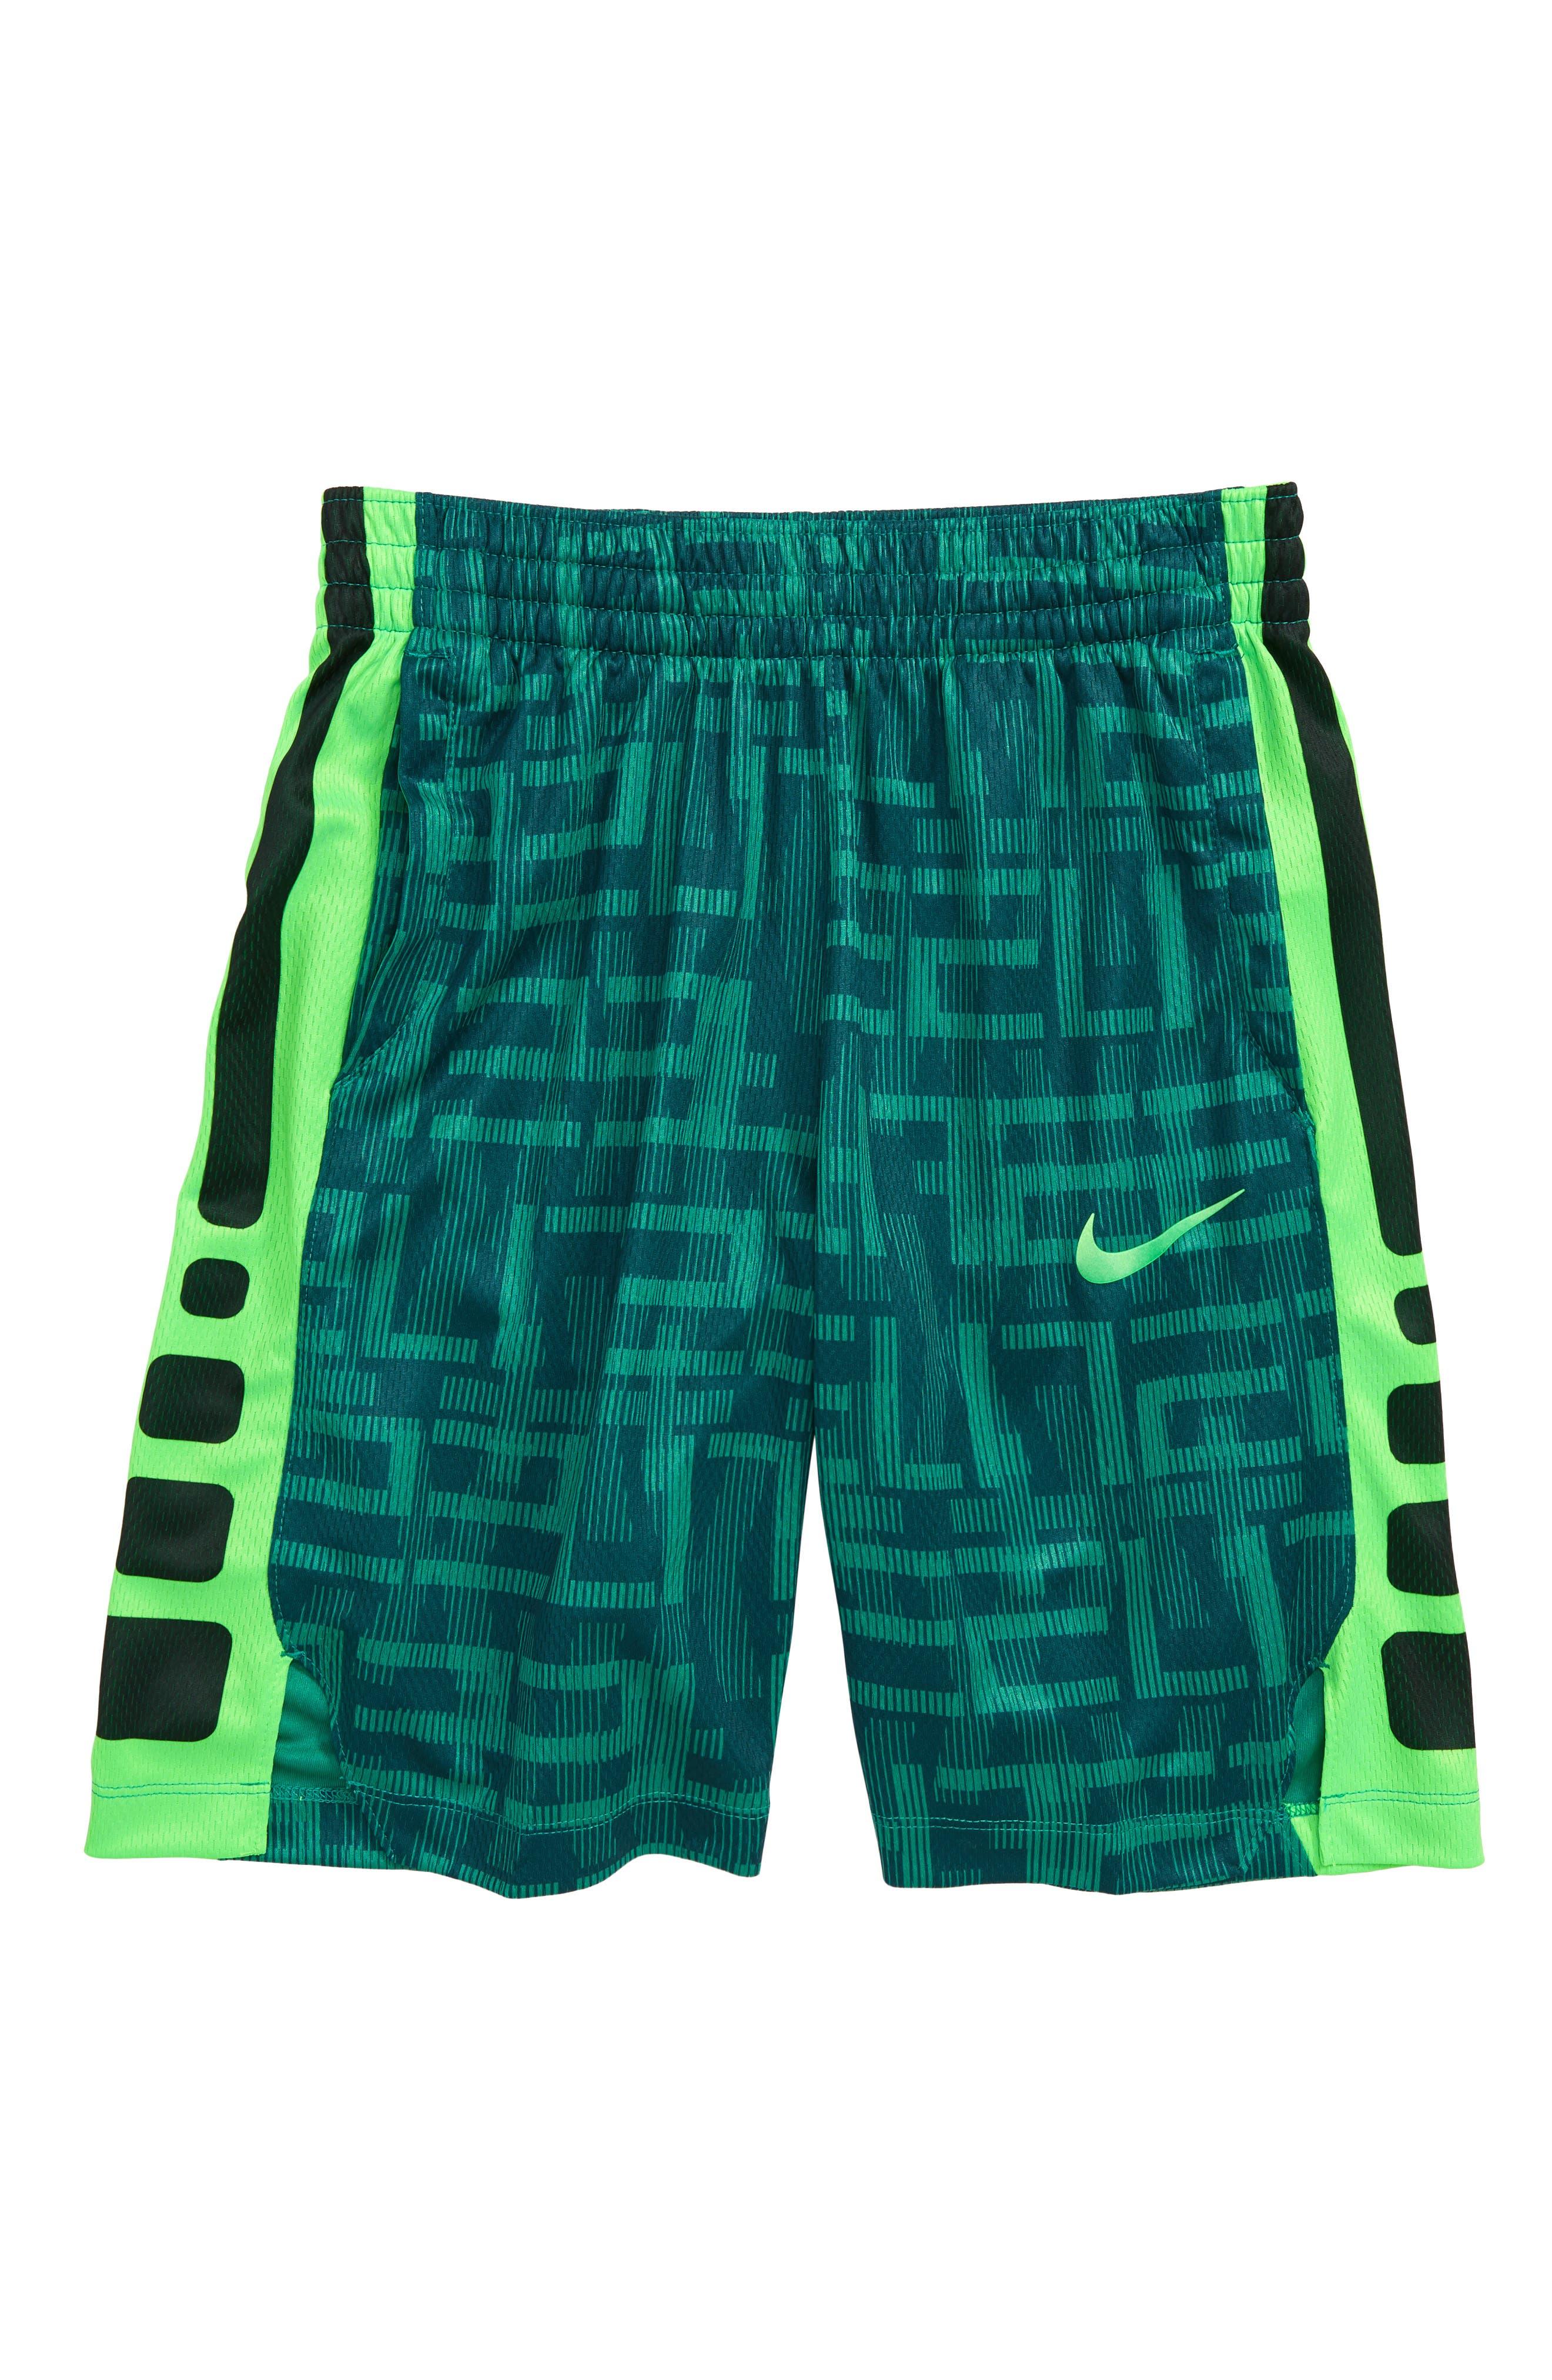 Dry Elite Basketball Shorts,                         Main,                         color, Green Noise/ Black